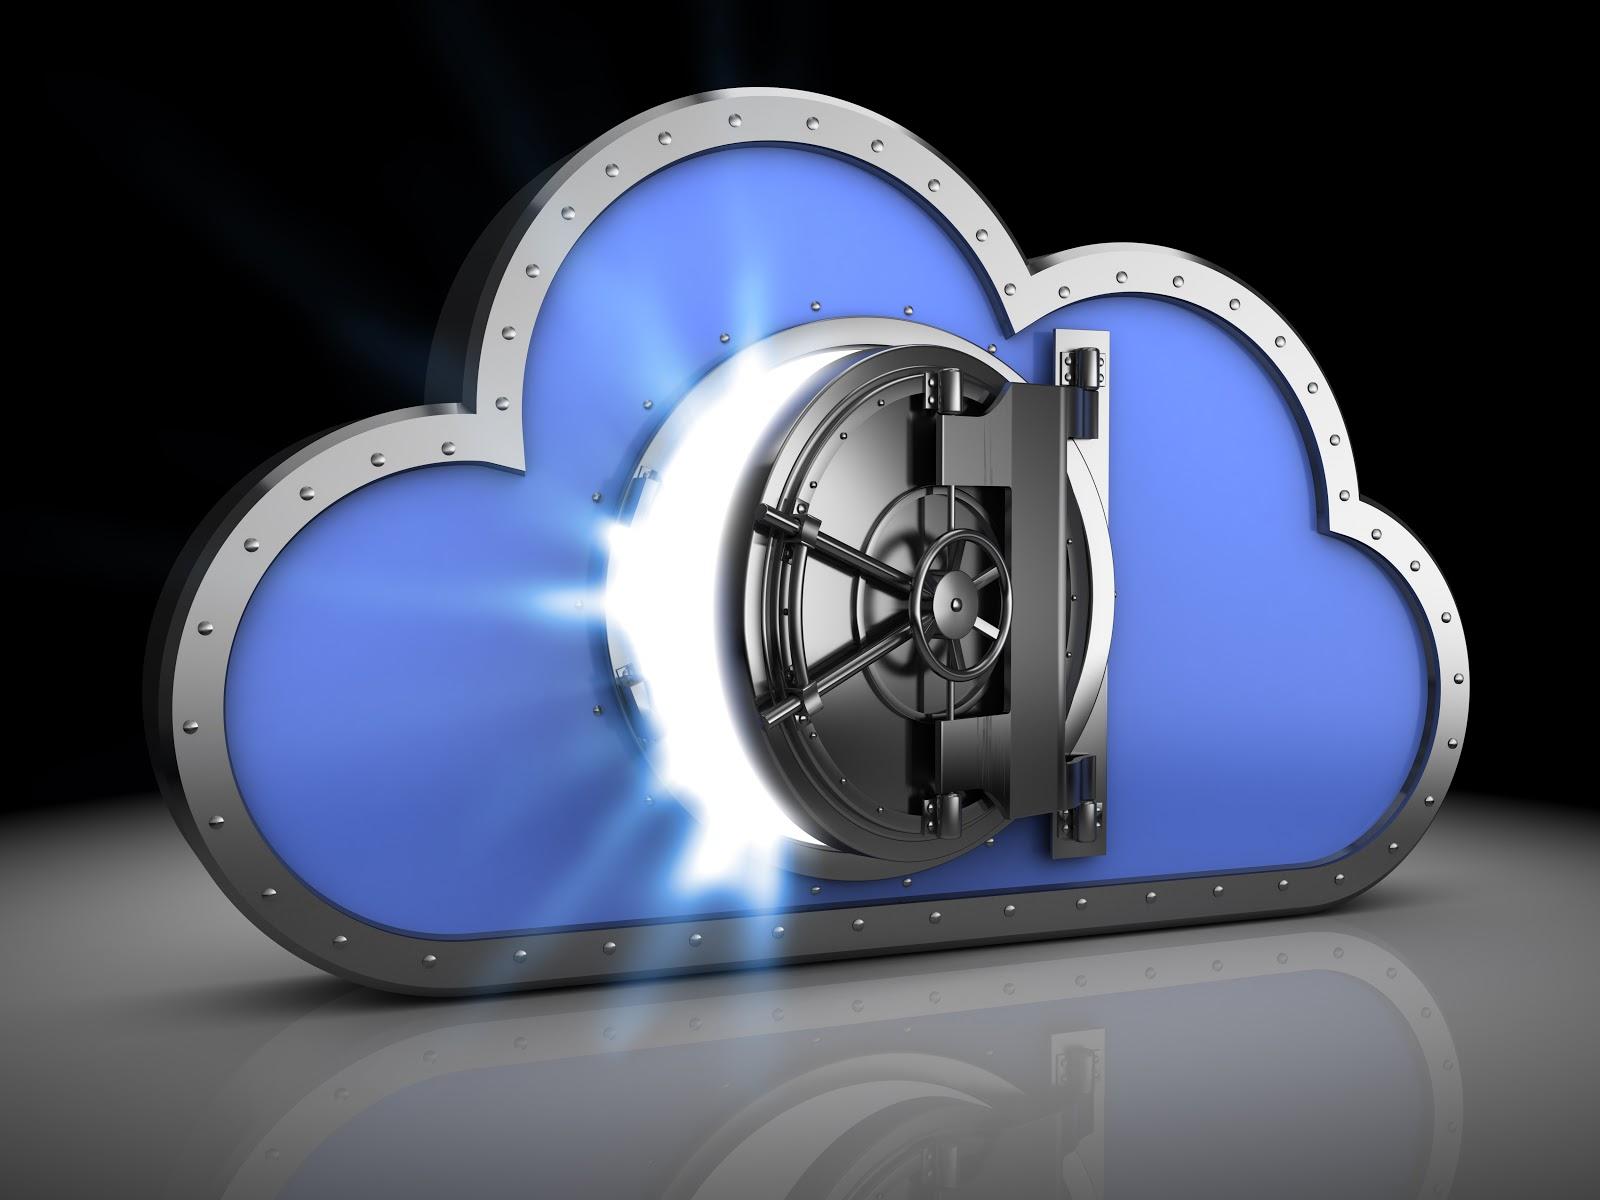 cloud to cloud backup 2